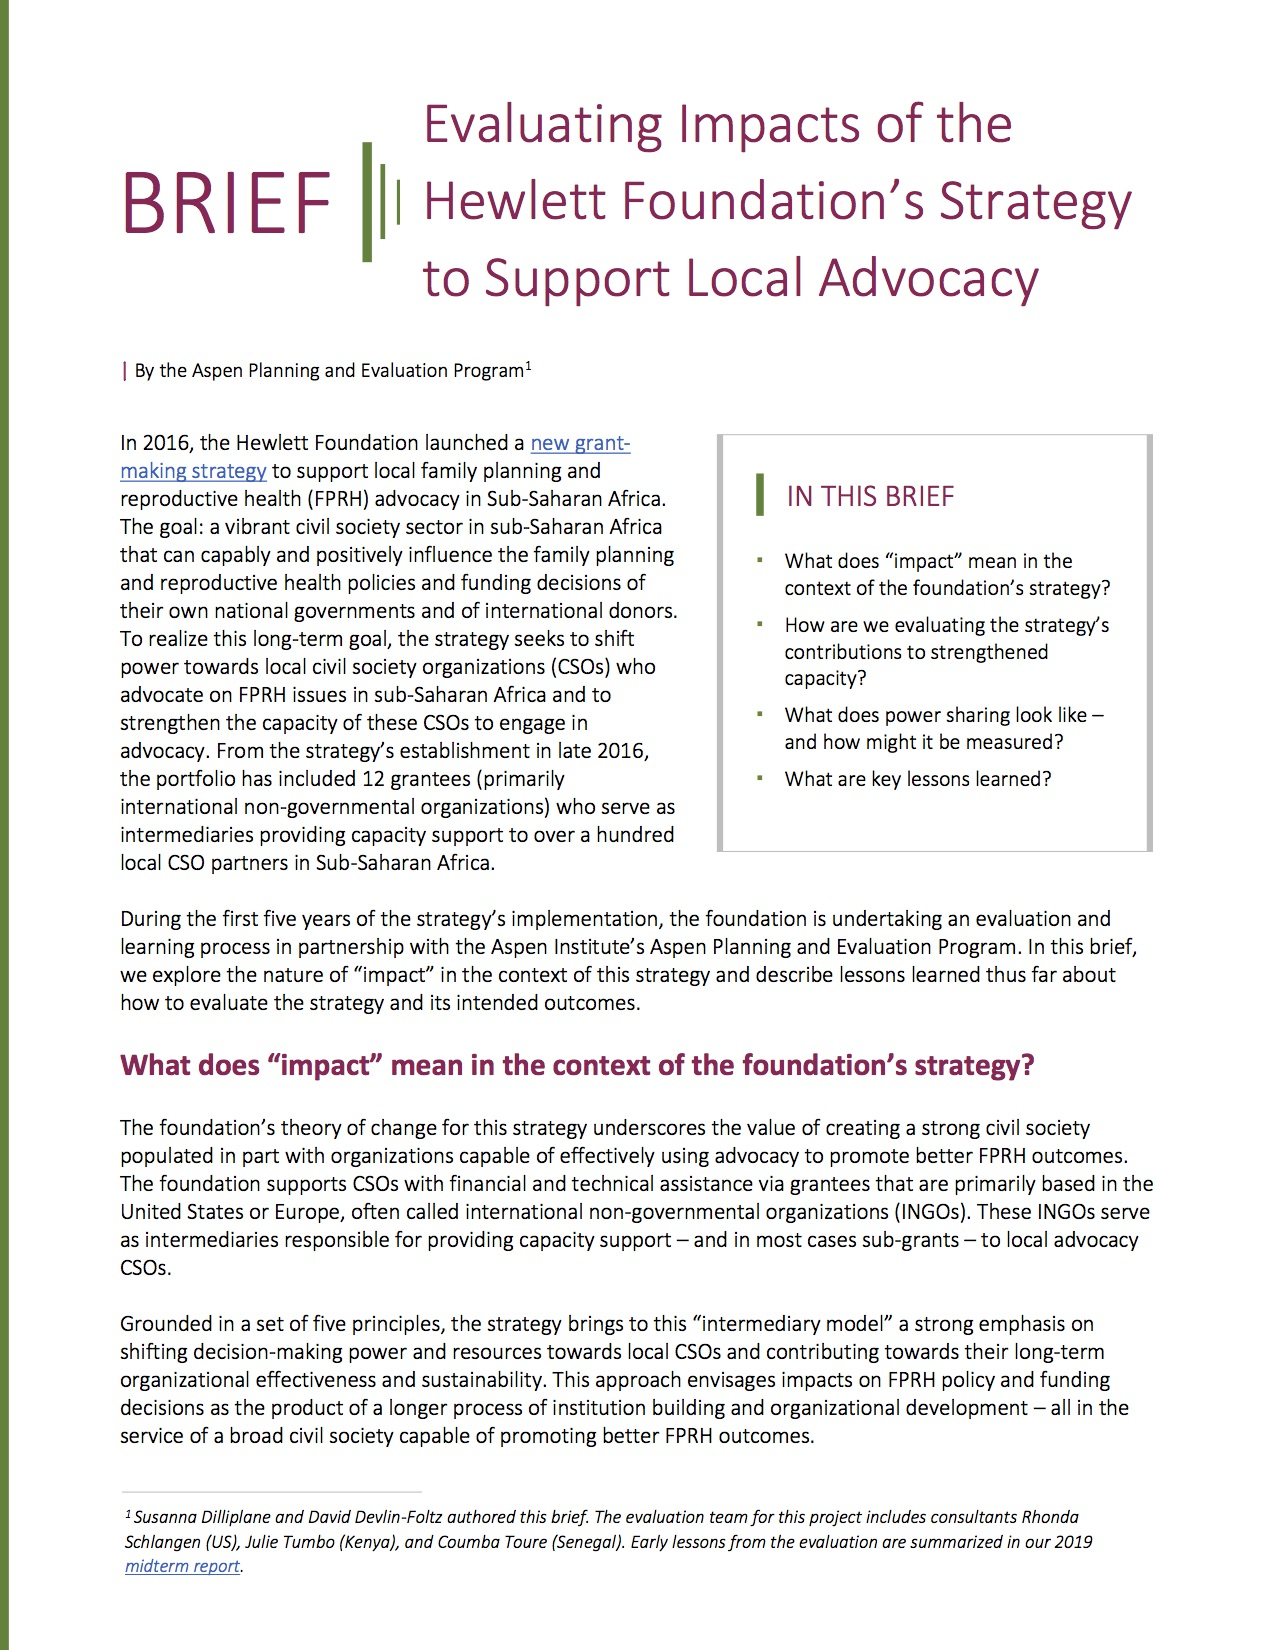 Brief: Evaluating Capacity and Power Sharing